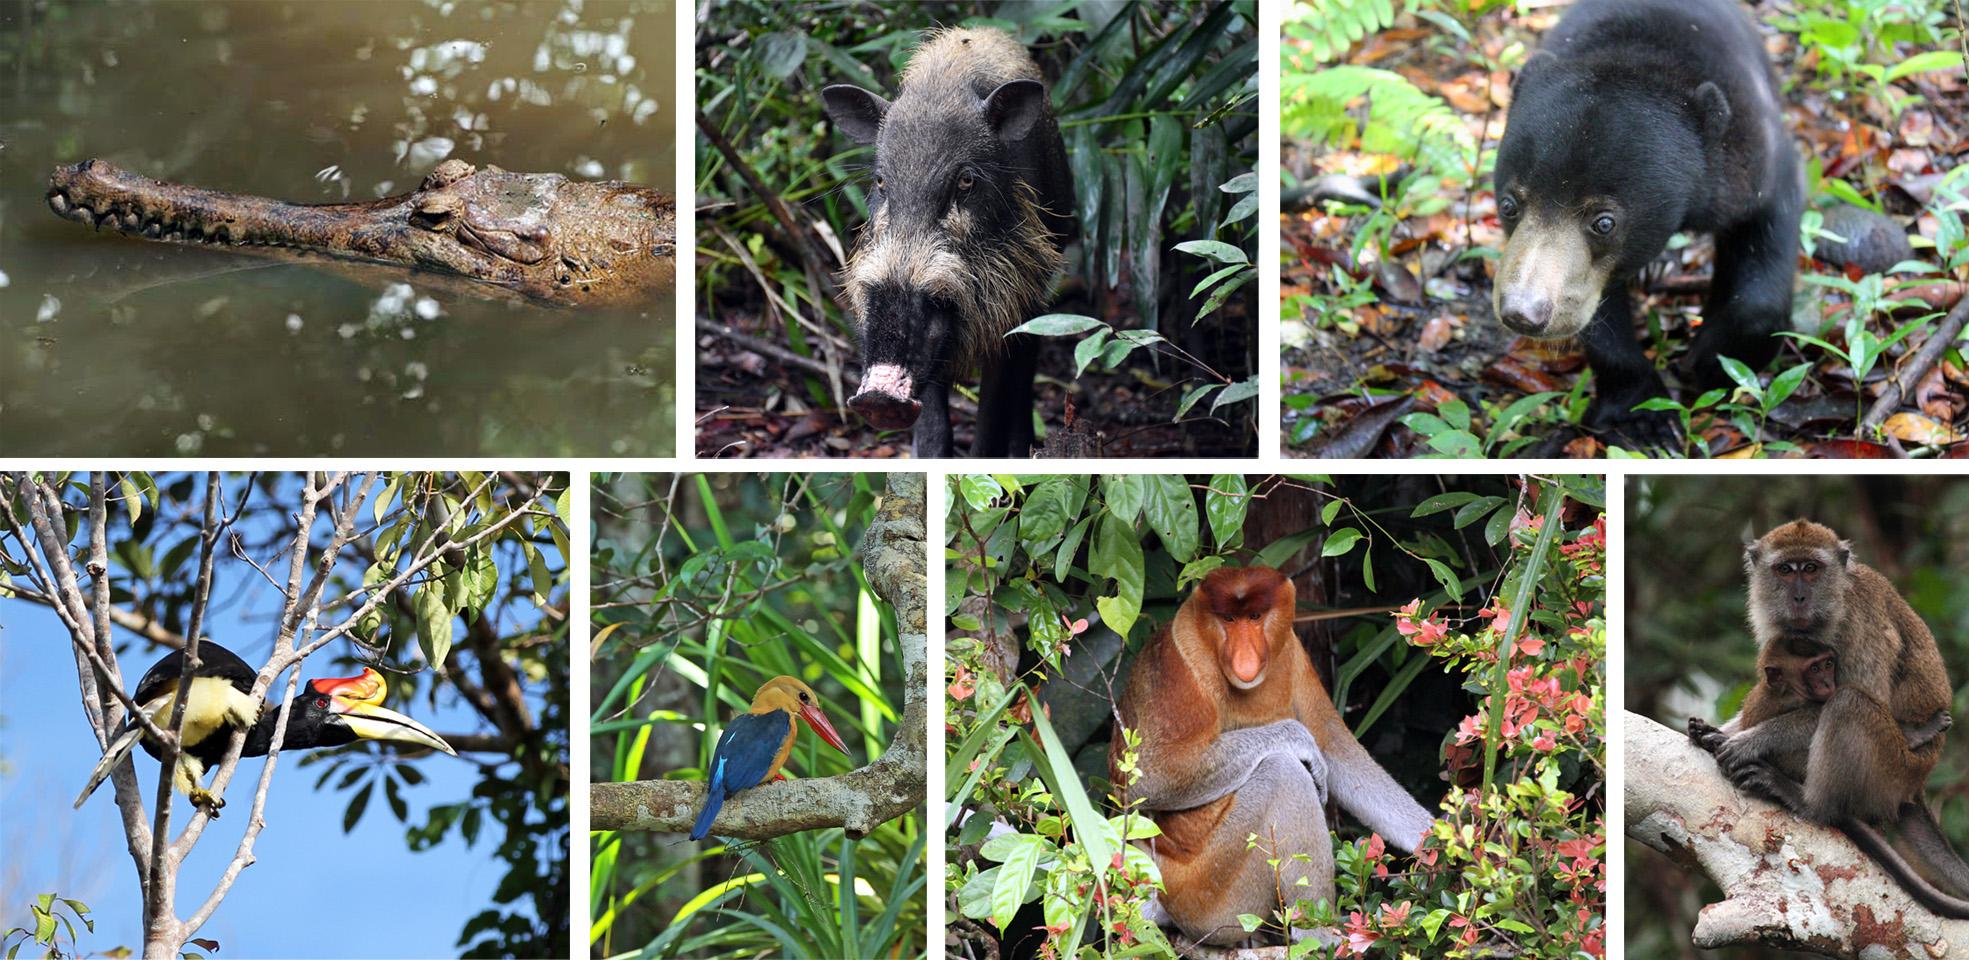 Tanjung Puting - Diversity of Species